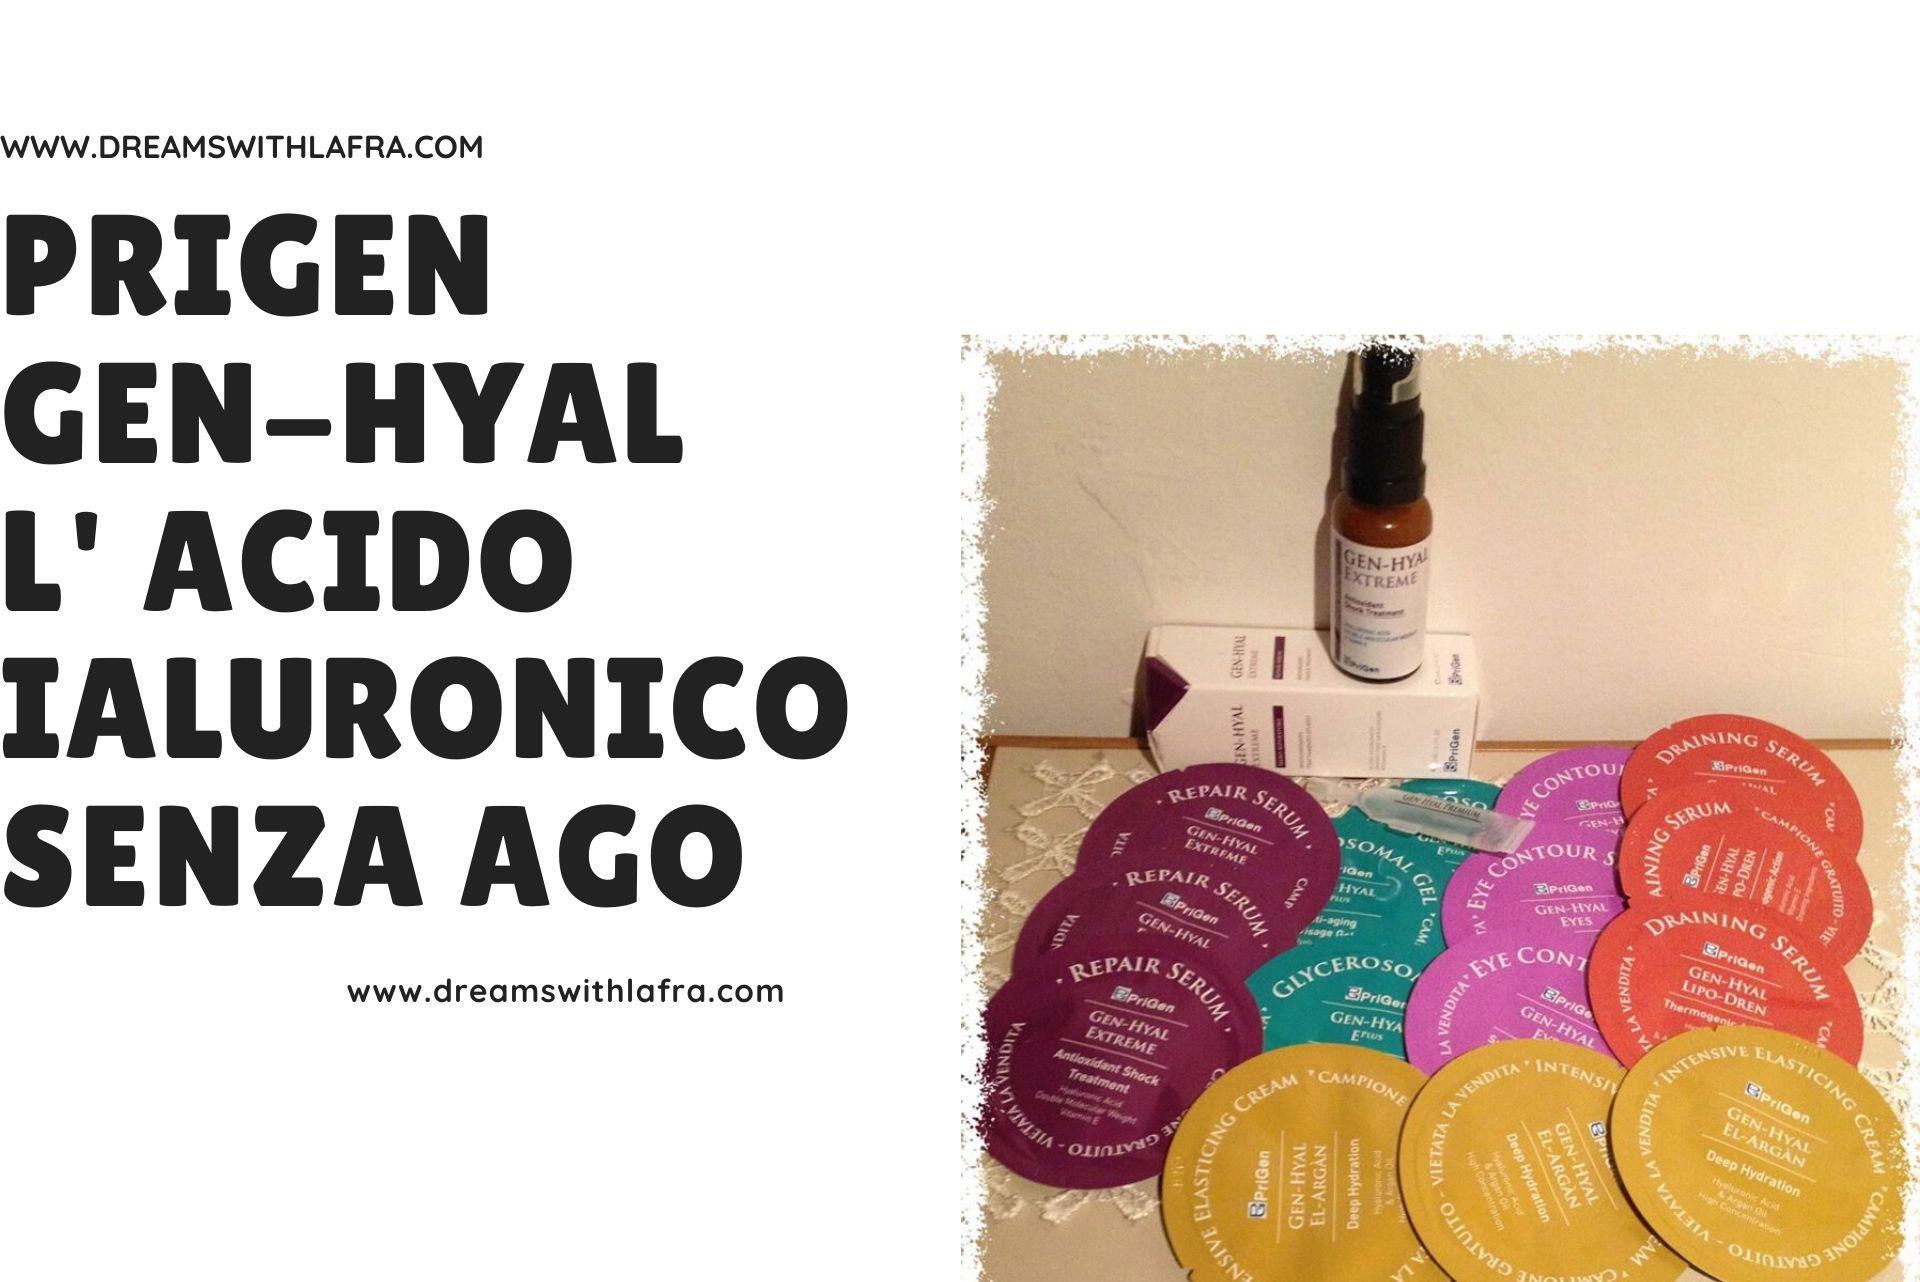 Prigen Gen-Hyal l' acido ialuronico senza ago